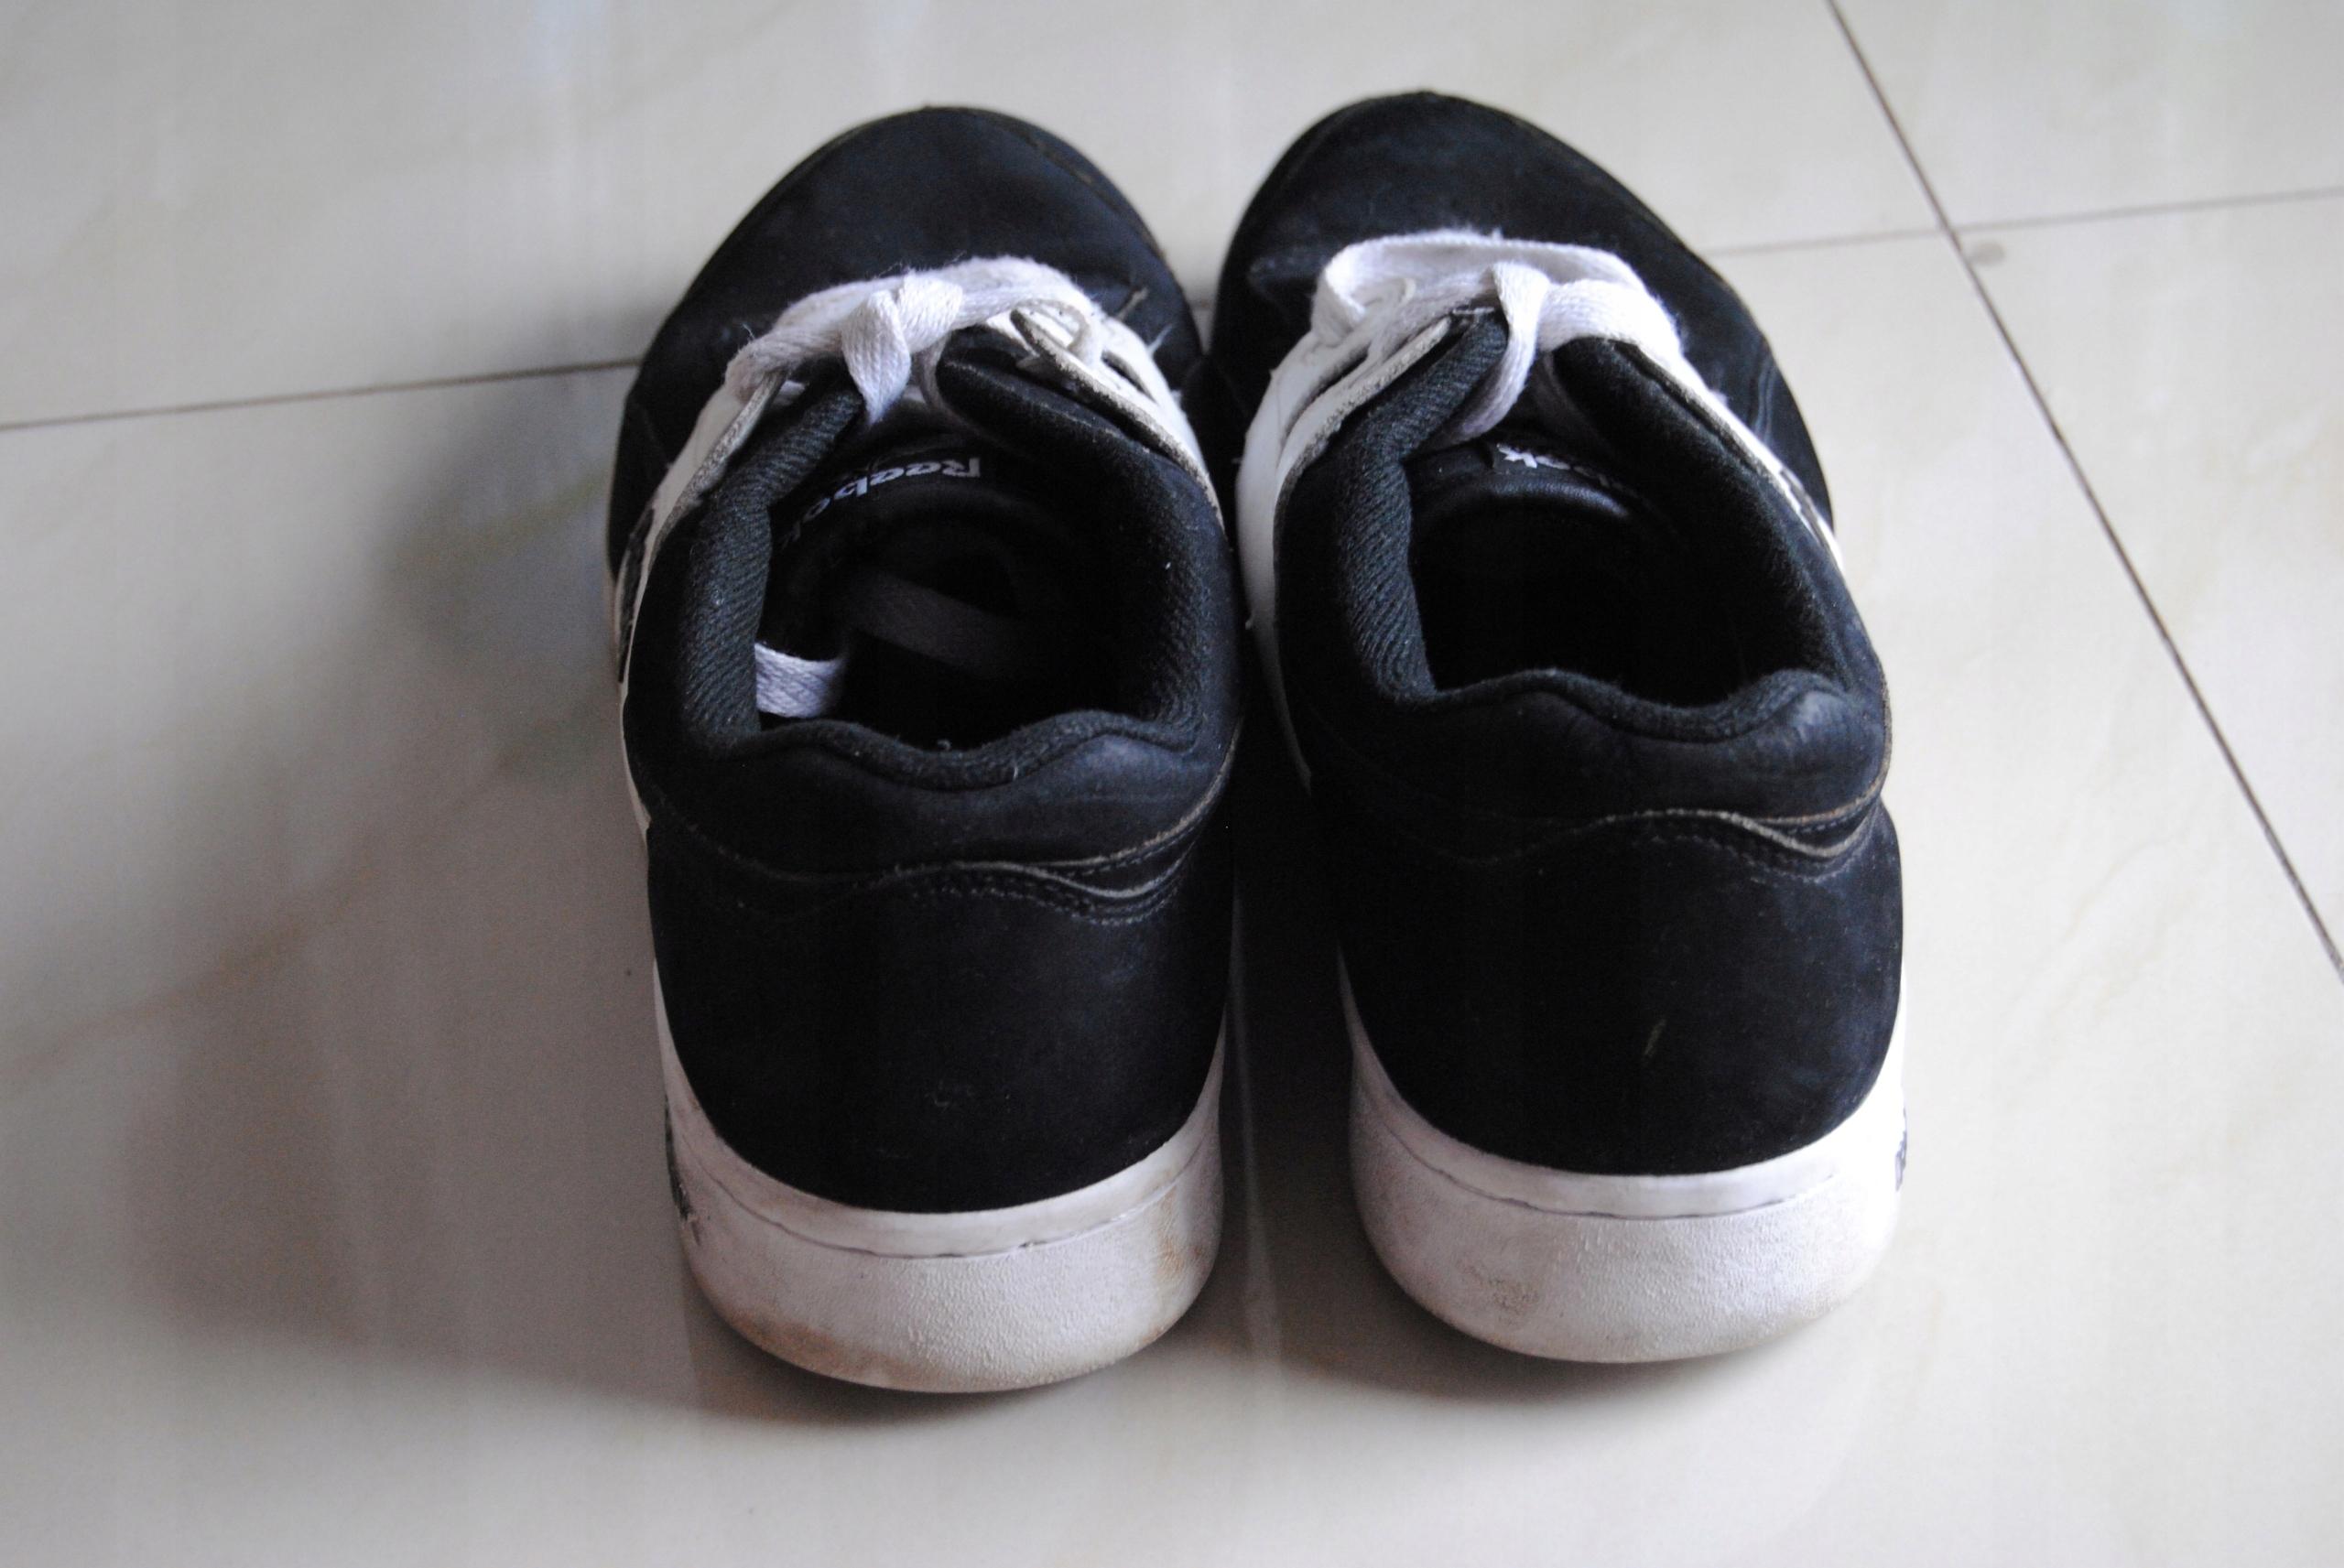 91e057d4 buty REEBOK Classic czarno-białe 43 sportowe - 7529278551 ...